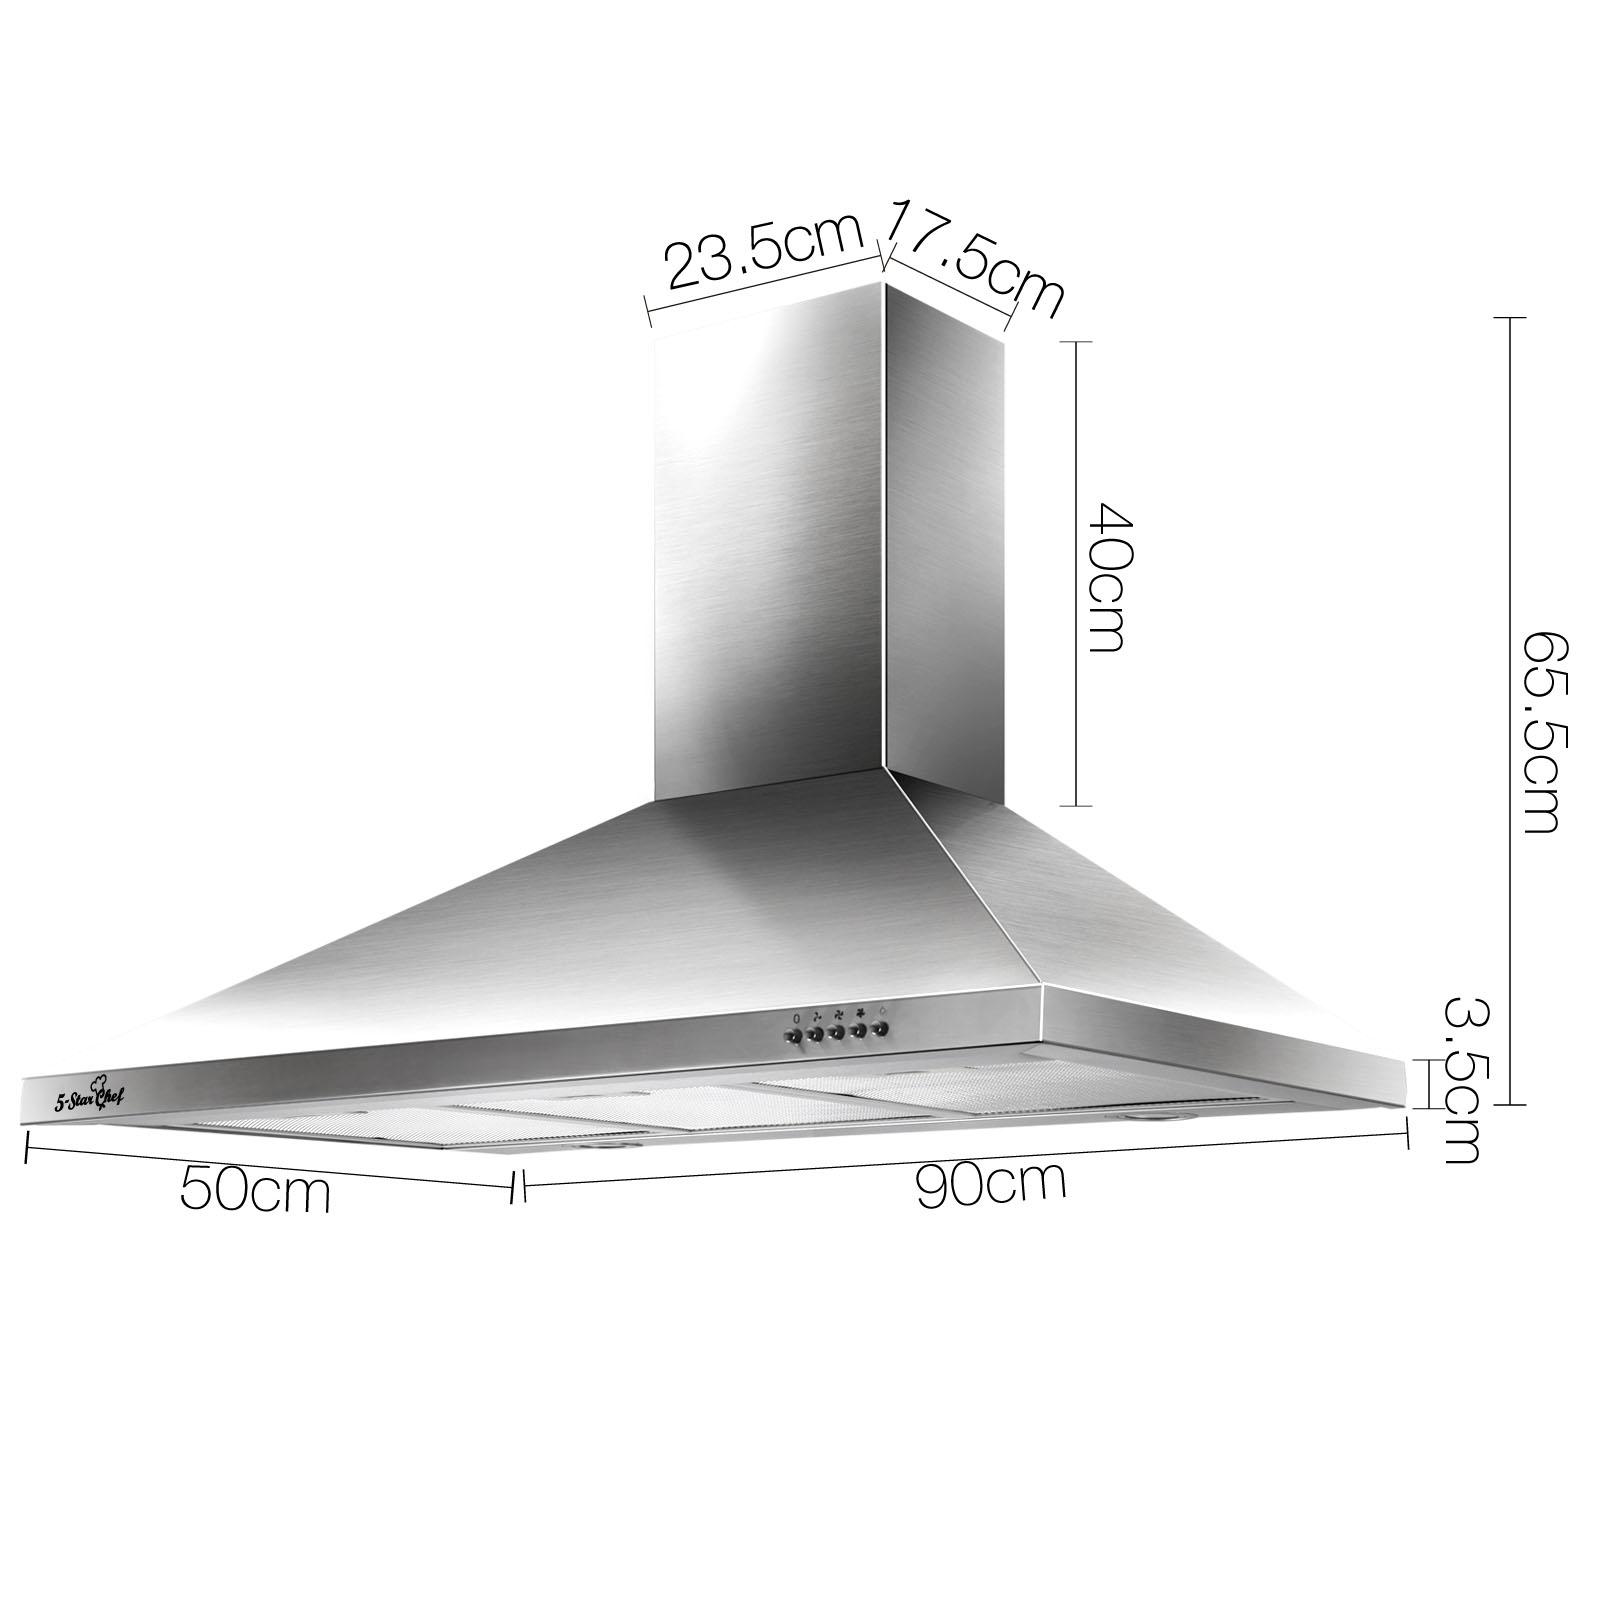 Range Hood Wall Mount Stainless Steel 900mm 90cm Kitchen